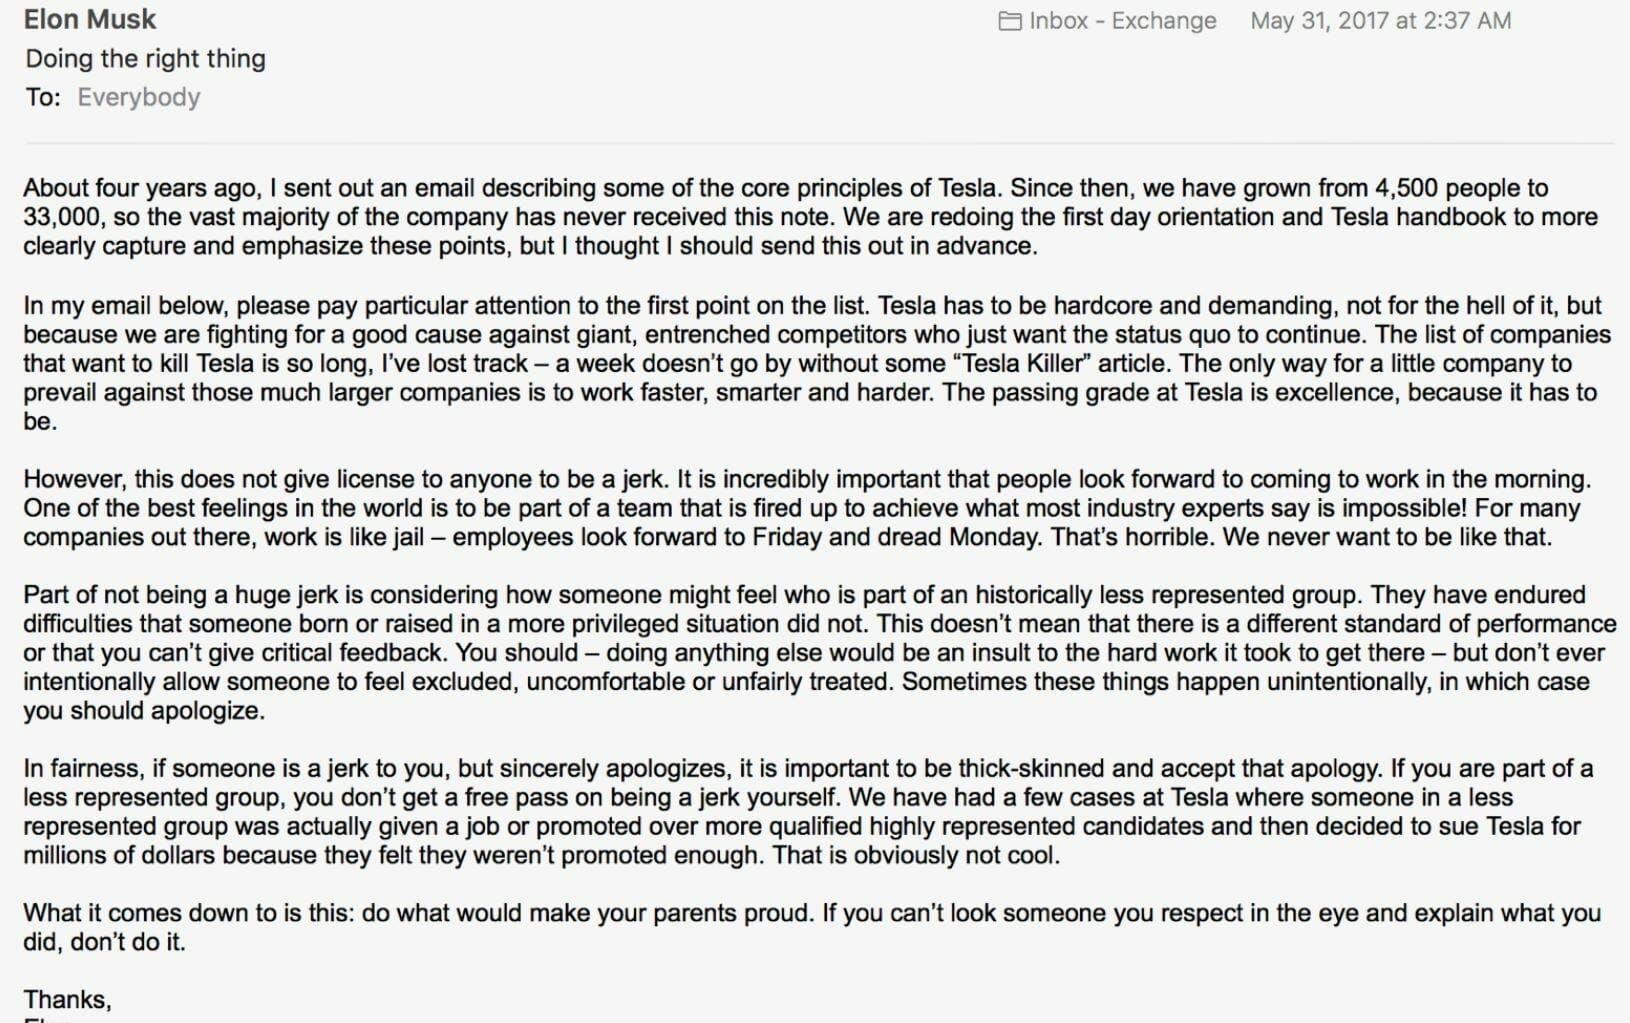 elon musk letter to employees lawsuit